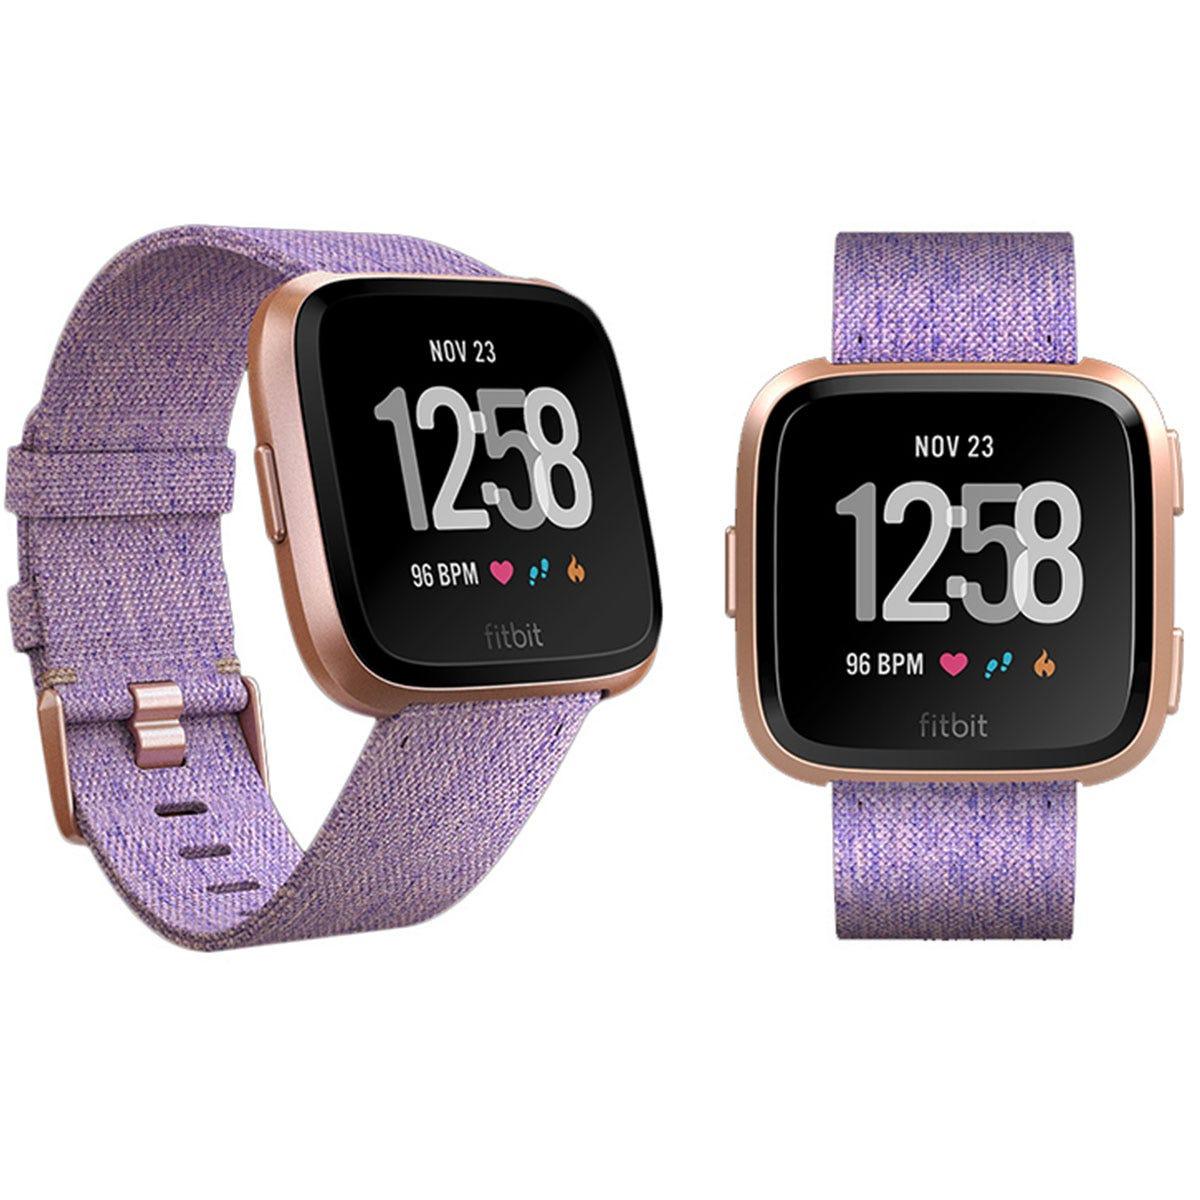 Fitbit Versa Special Edition Smartwatch - Lavender